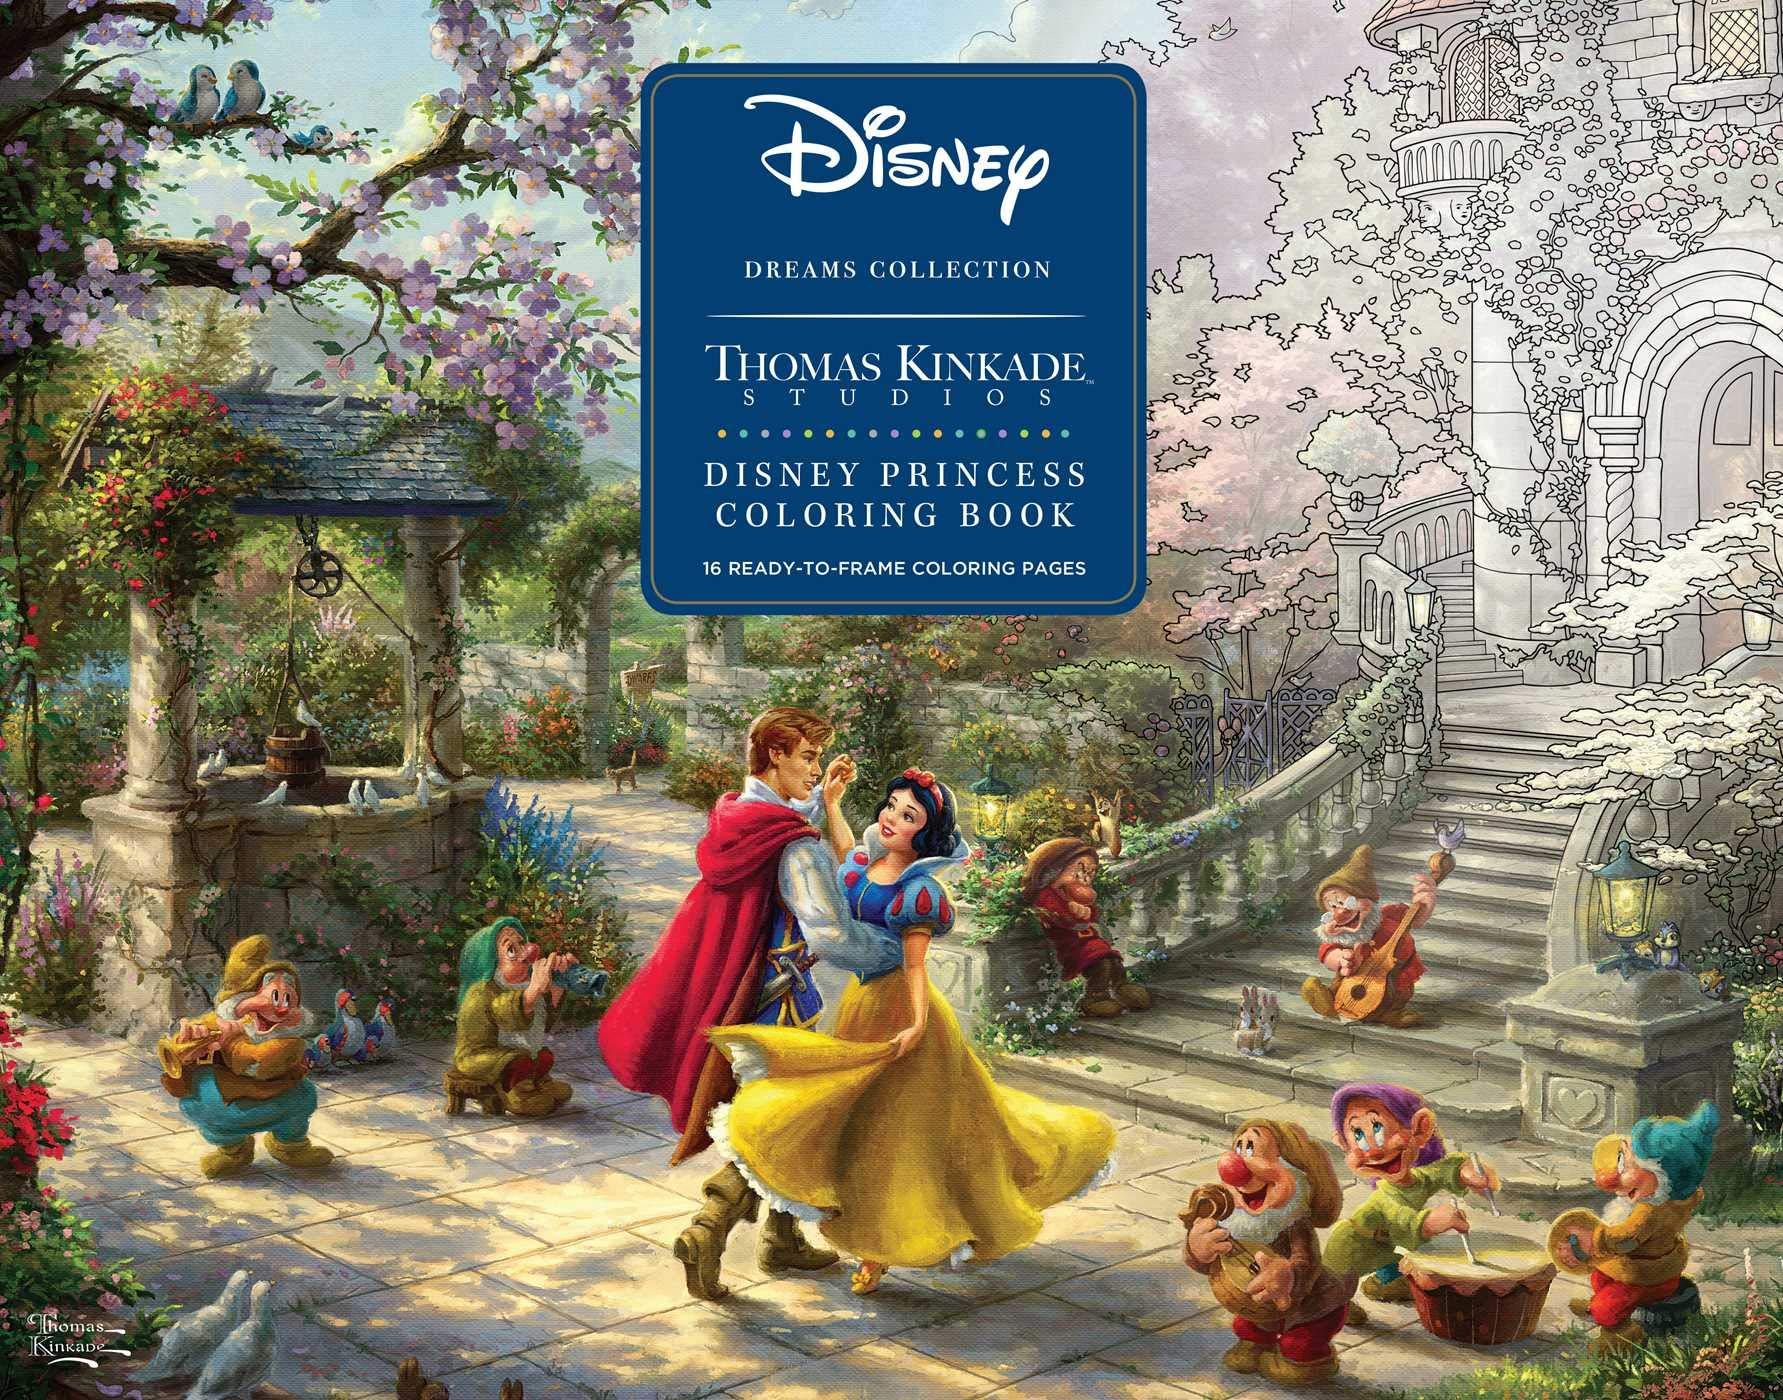 Amazon Com Disney Dreams Collection Thomas Kinkade Studios Disney Princess Coloring Poster Book 0050837423923 Kinkade Thomas Books